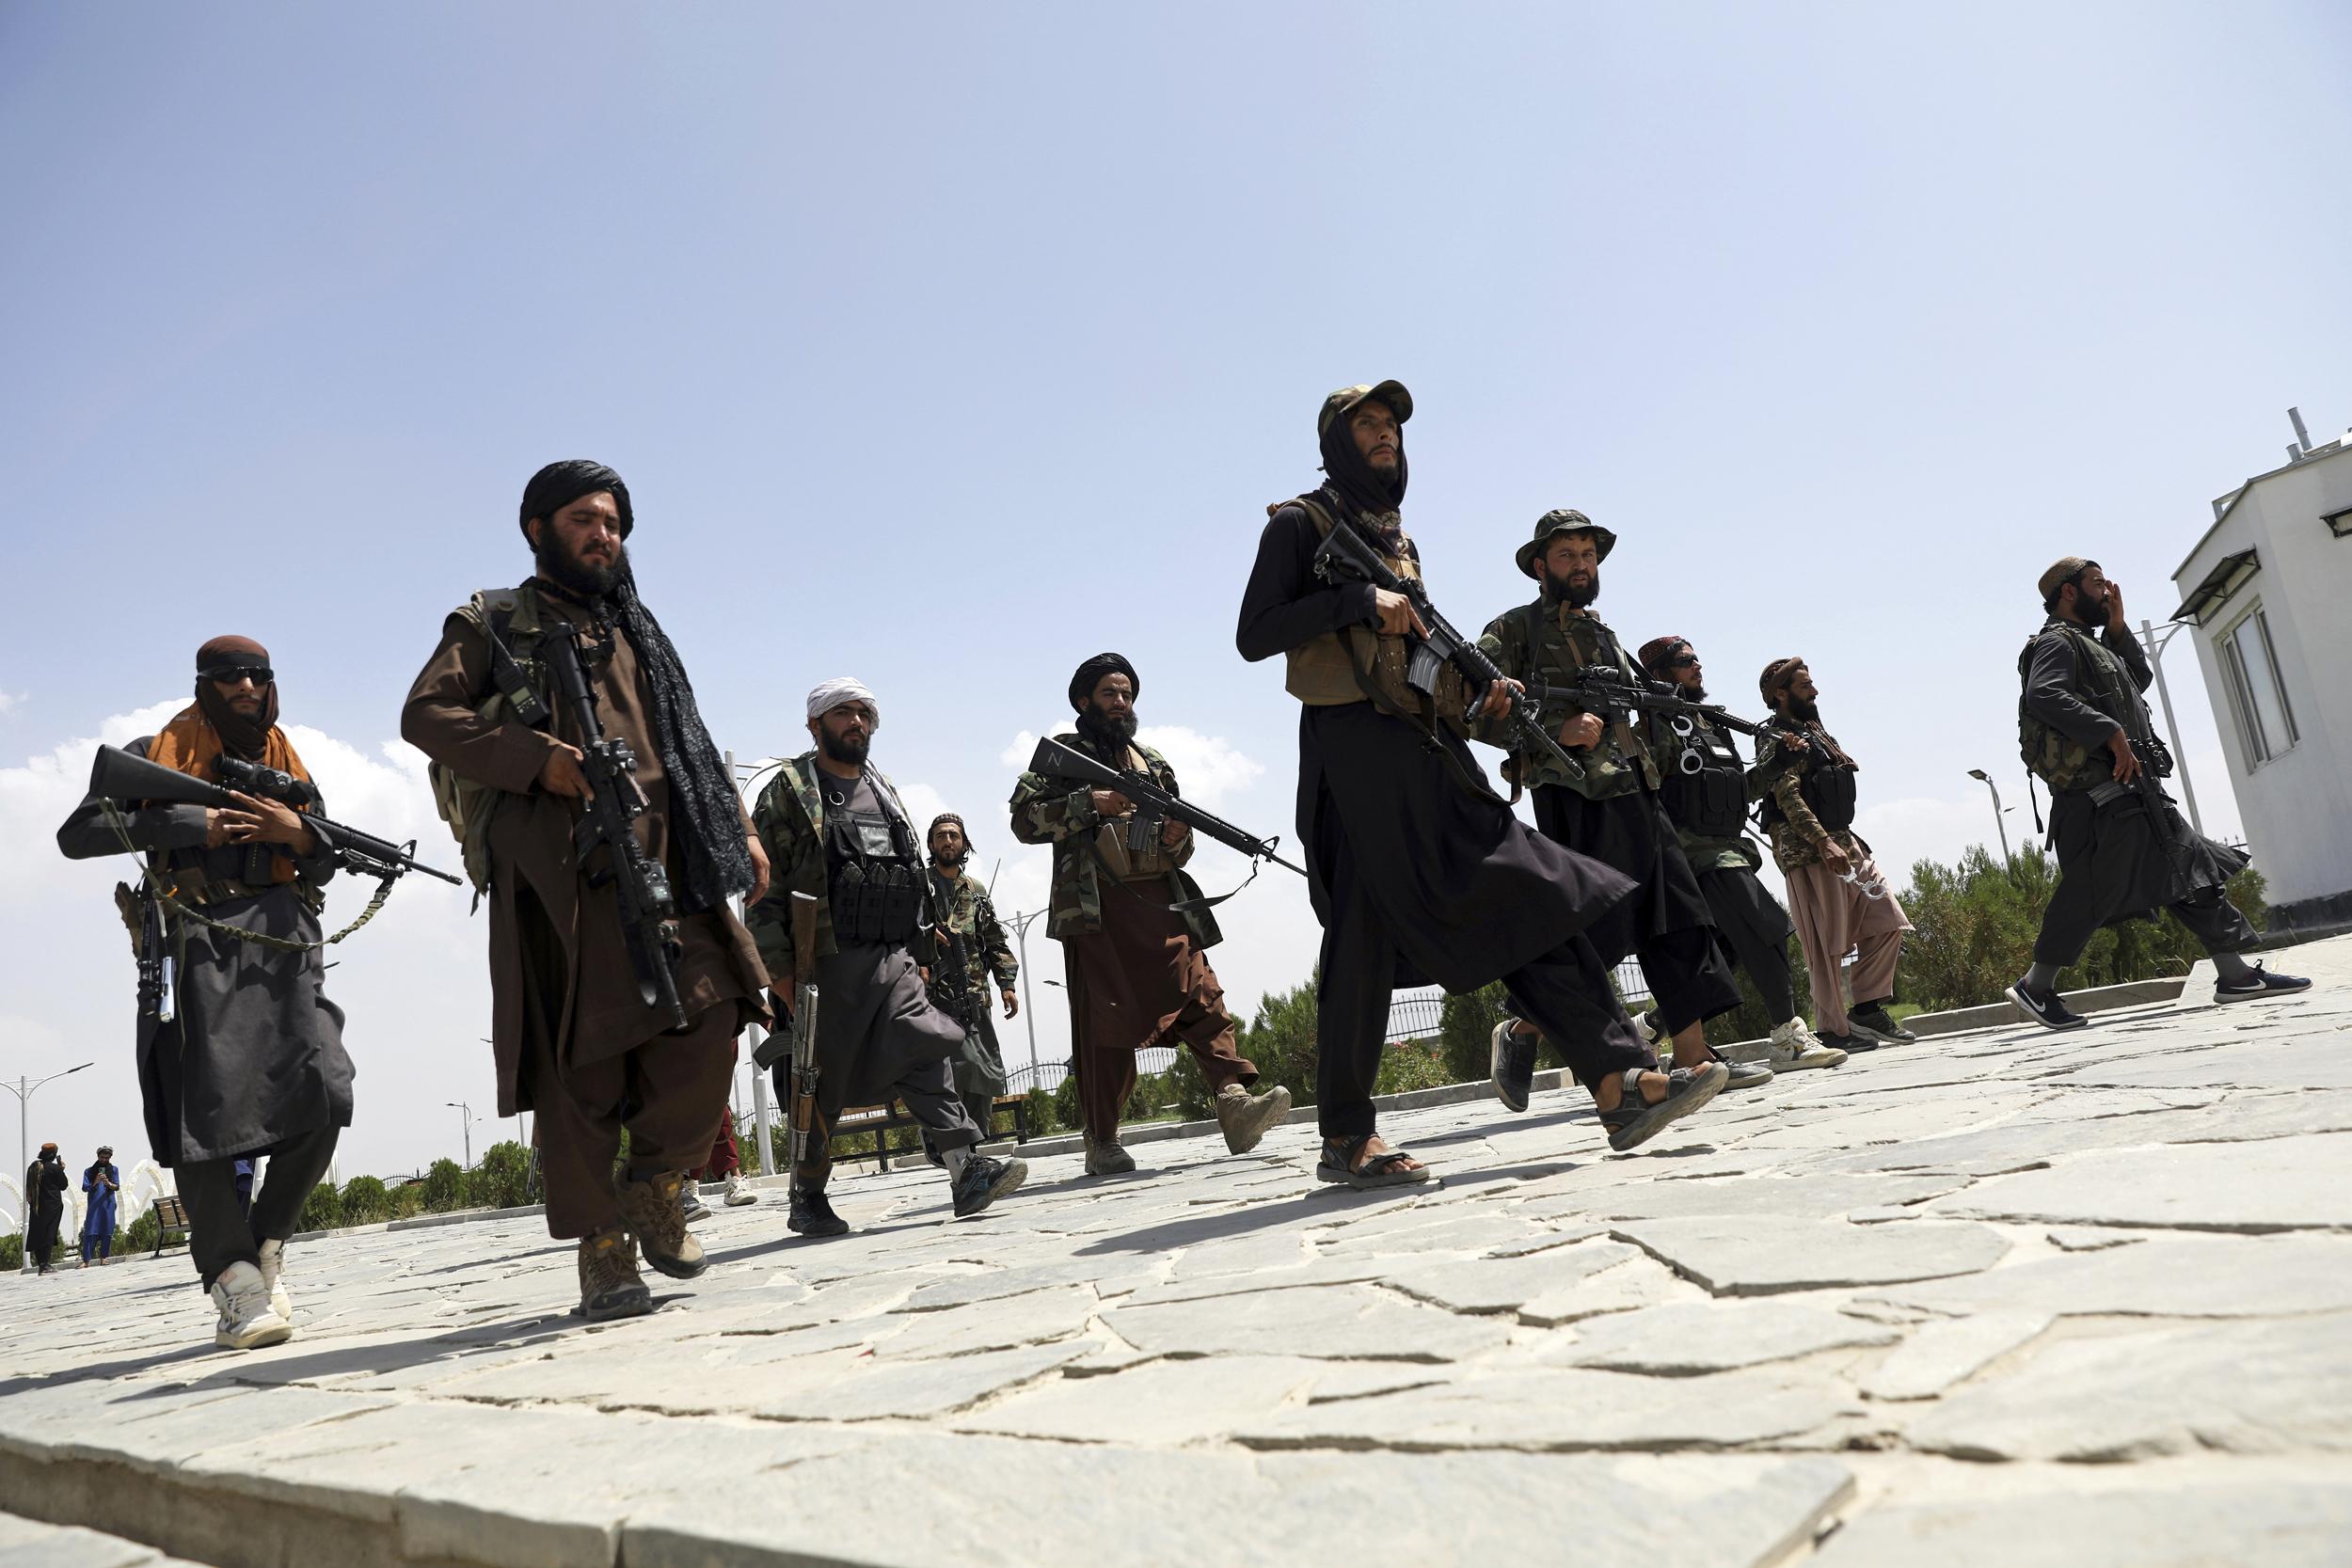 'A virtual death sentence': Gay Afghans brace for uncertain future under Taliban